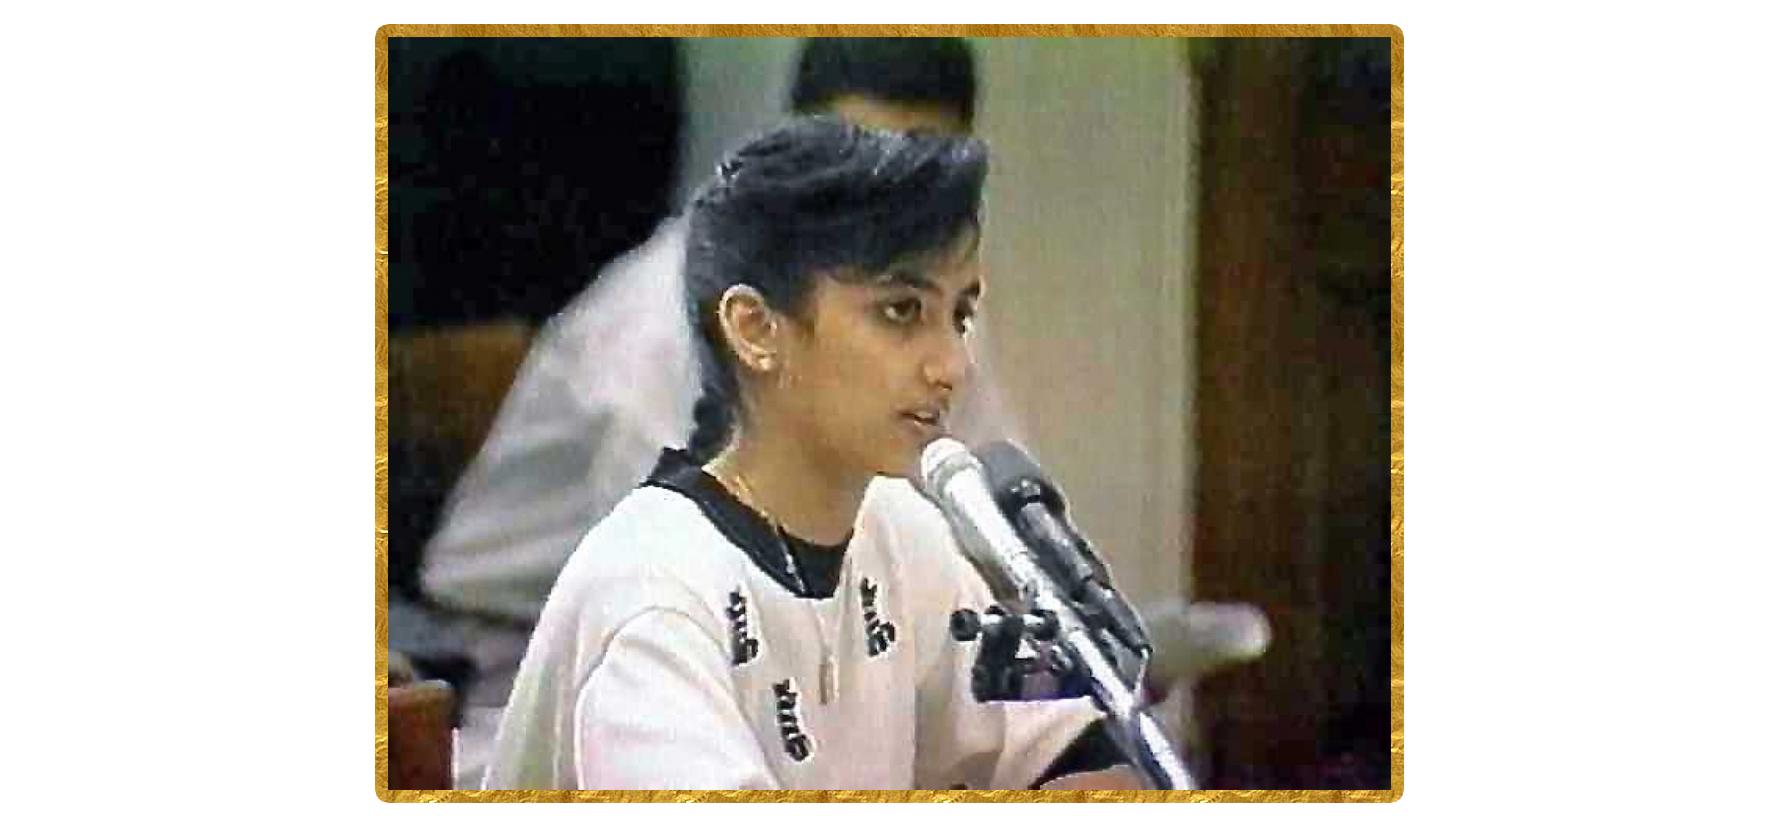 1990 Testimony of Nayirah